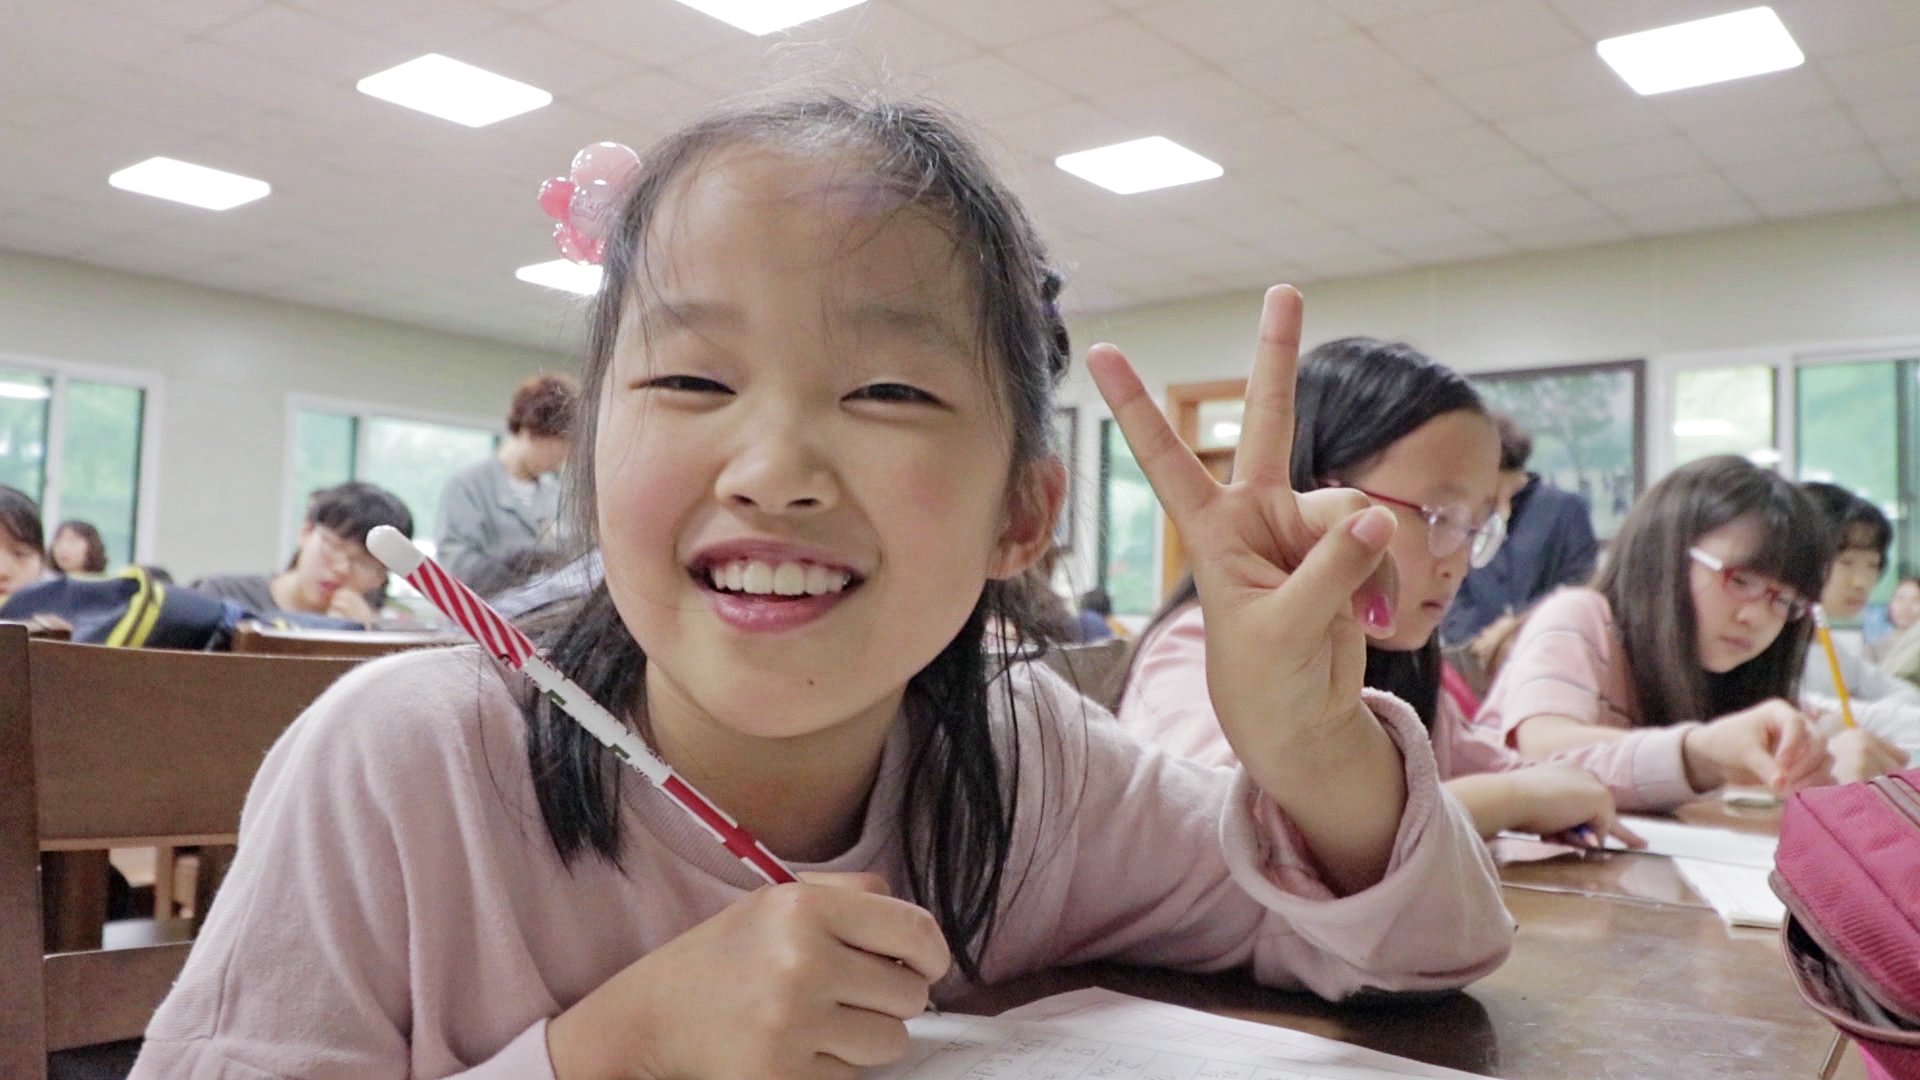 http://58.225.10.93/Media/EBN/EBNP0025/은평구어린이글짓기그리기대회.jpg